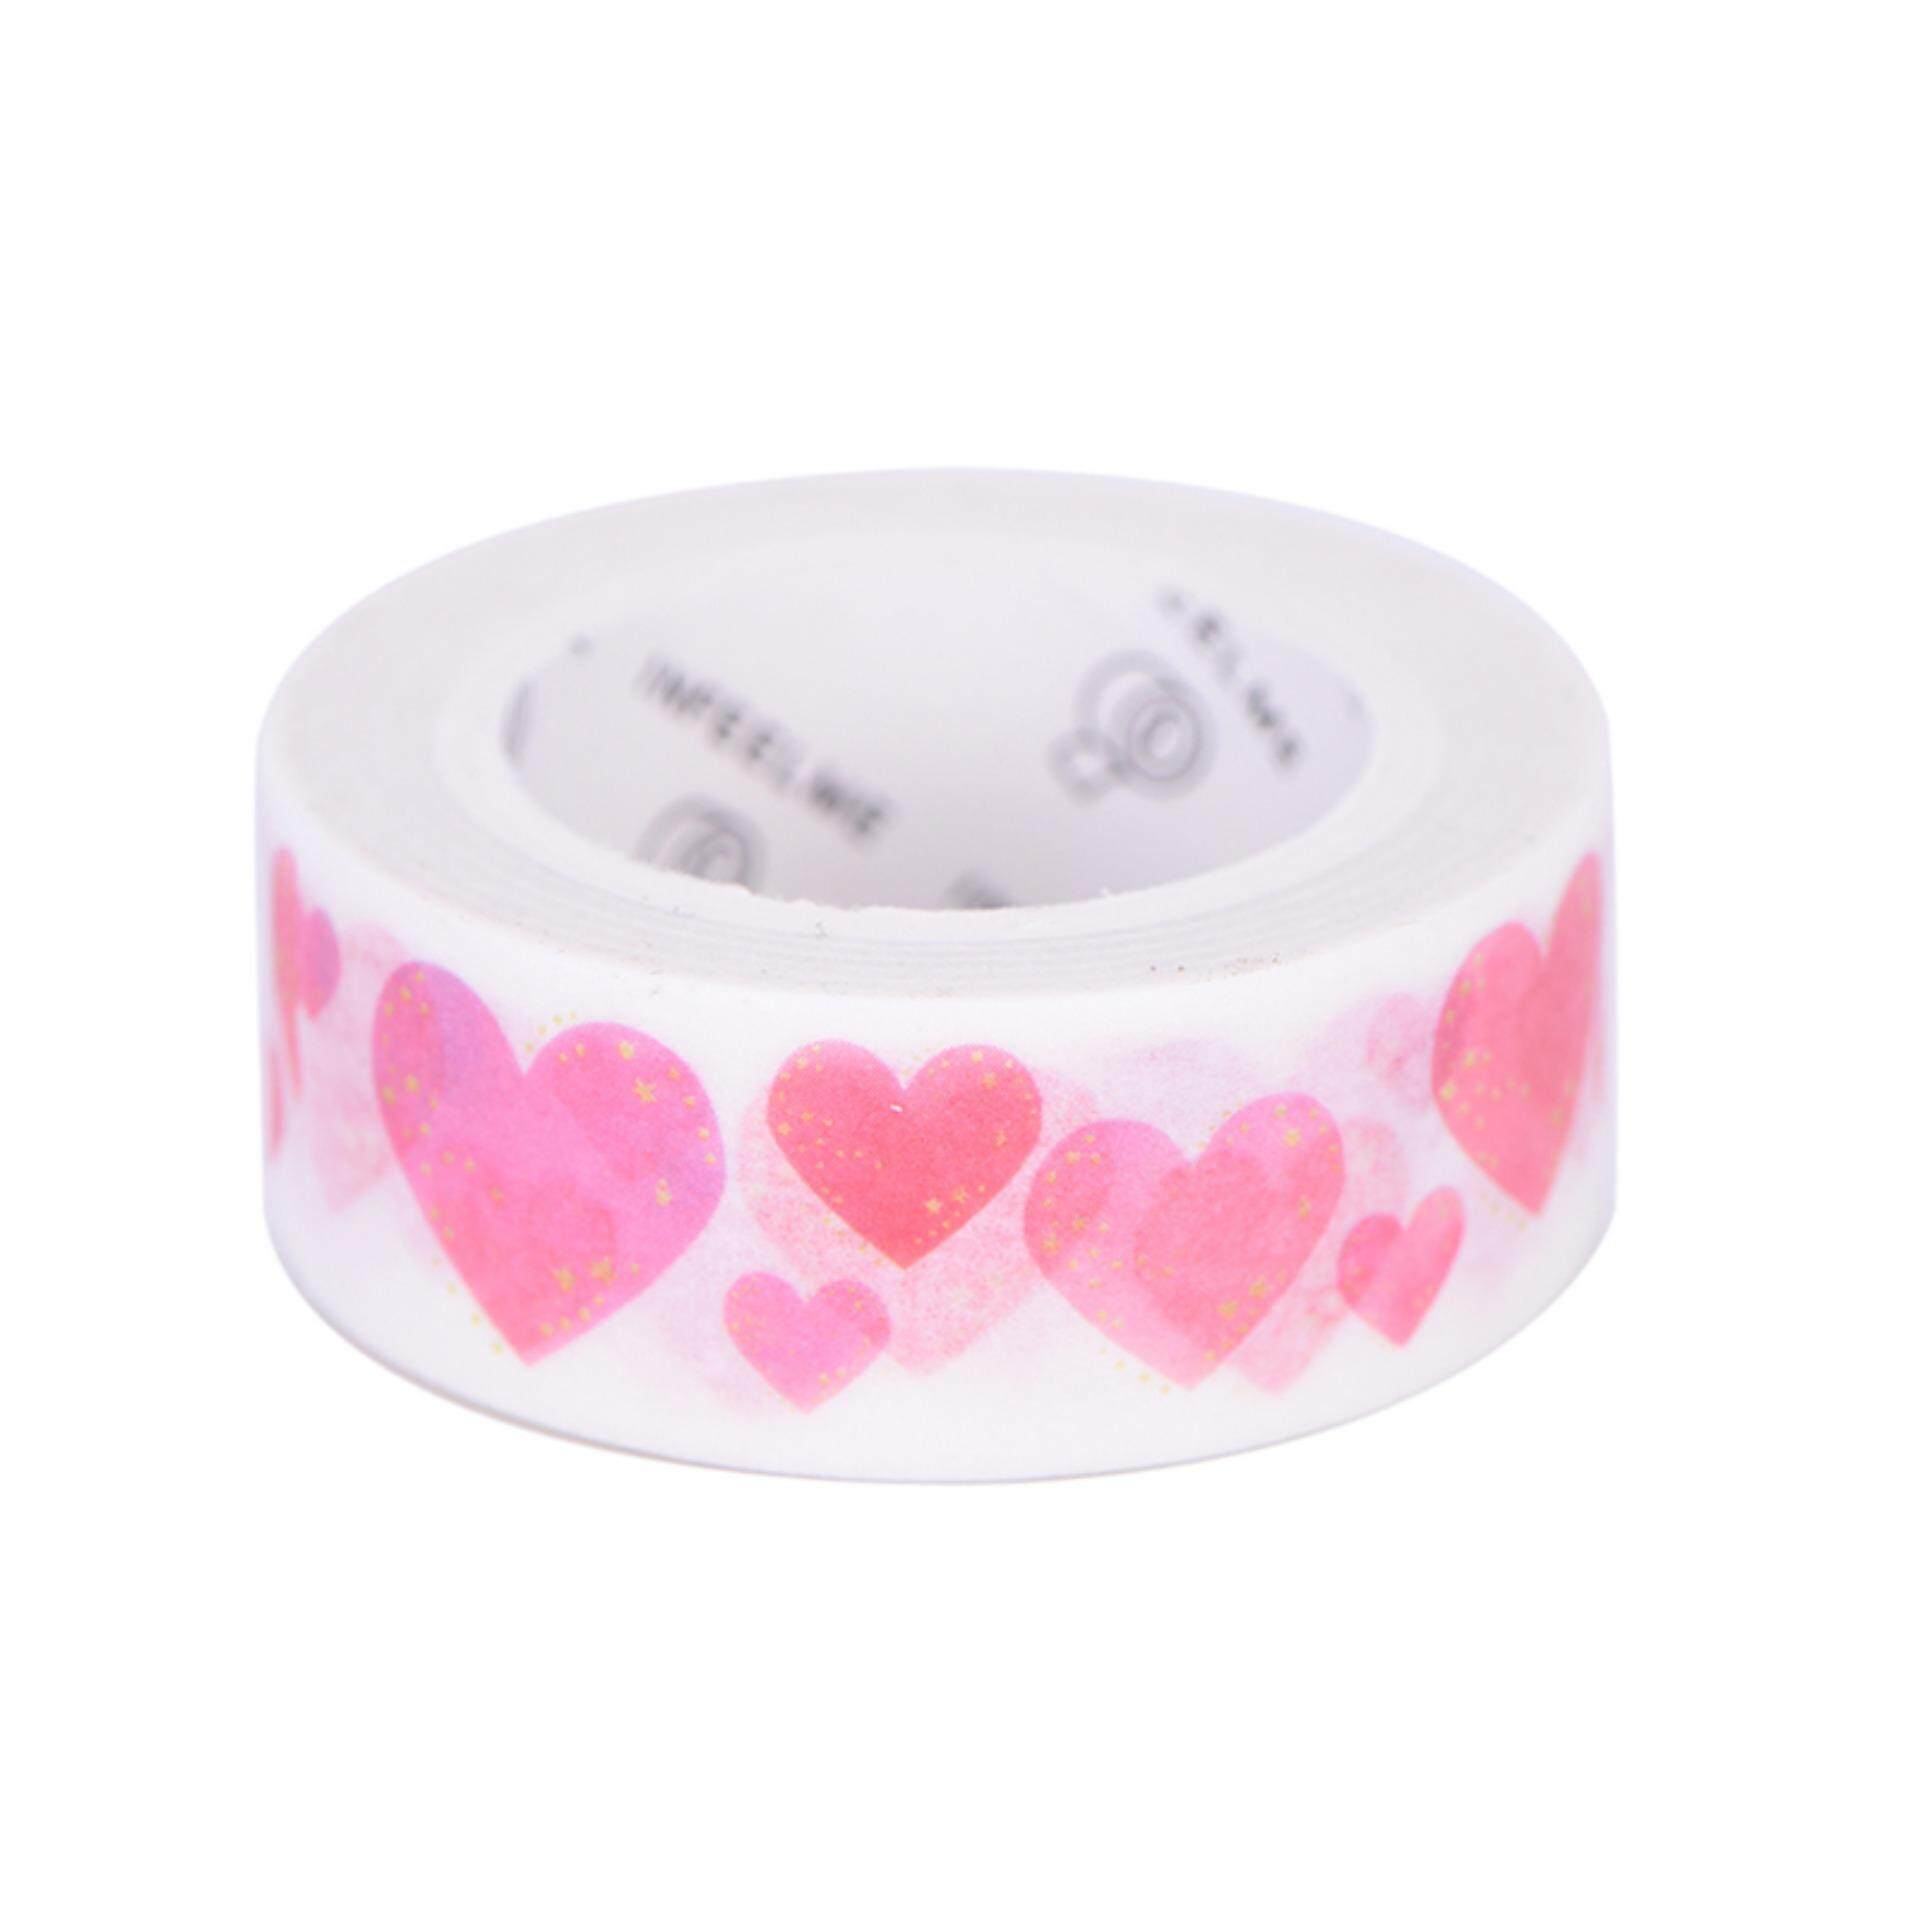 About 1.5cm X 7m Cute Kawaii Flowers Masking Washi Tape Decorative Adhesive Tape Decor Decora Diy Scrapbooking Sticker Label Stationery Heart